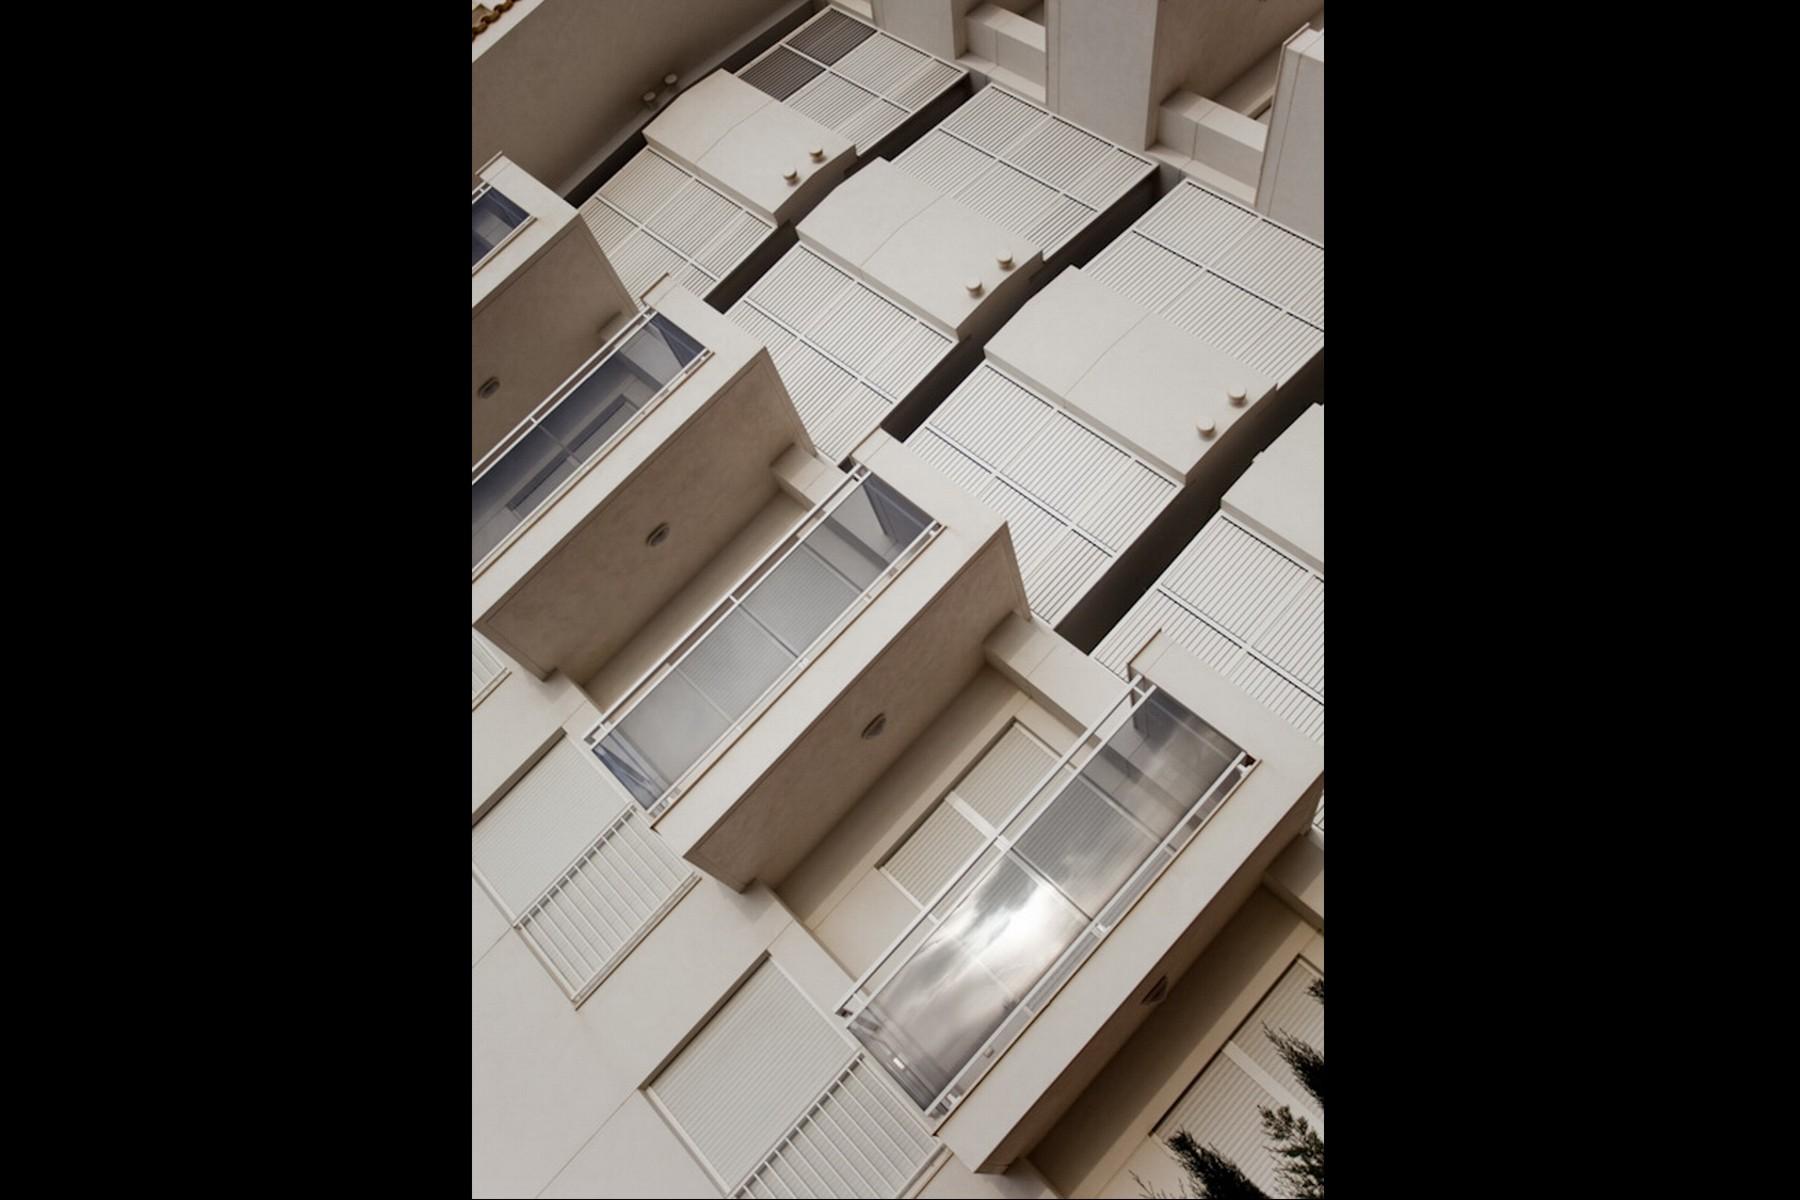 Imaginarq-155-Edificio-Viviendas-Altea-Alicante-05A